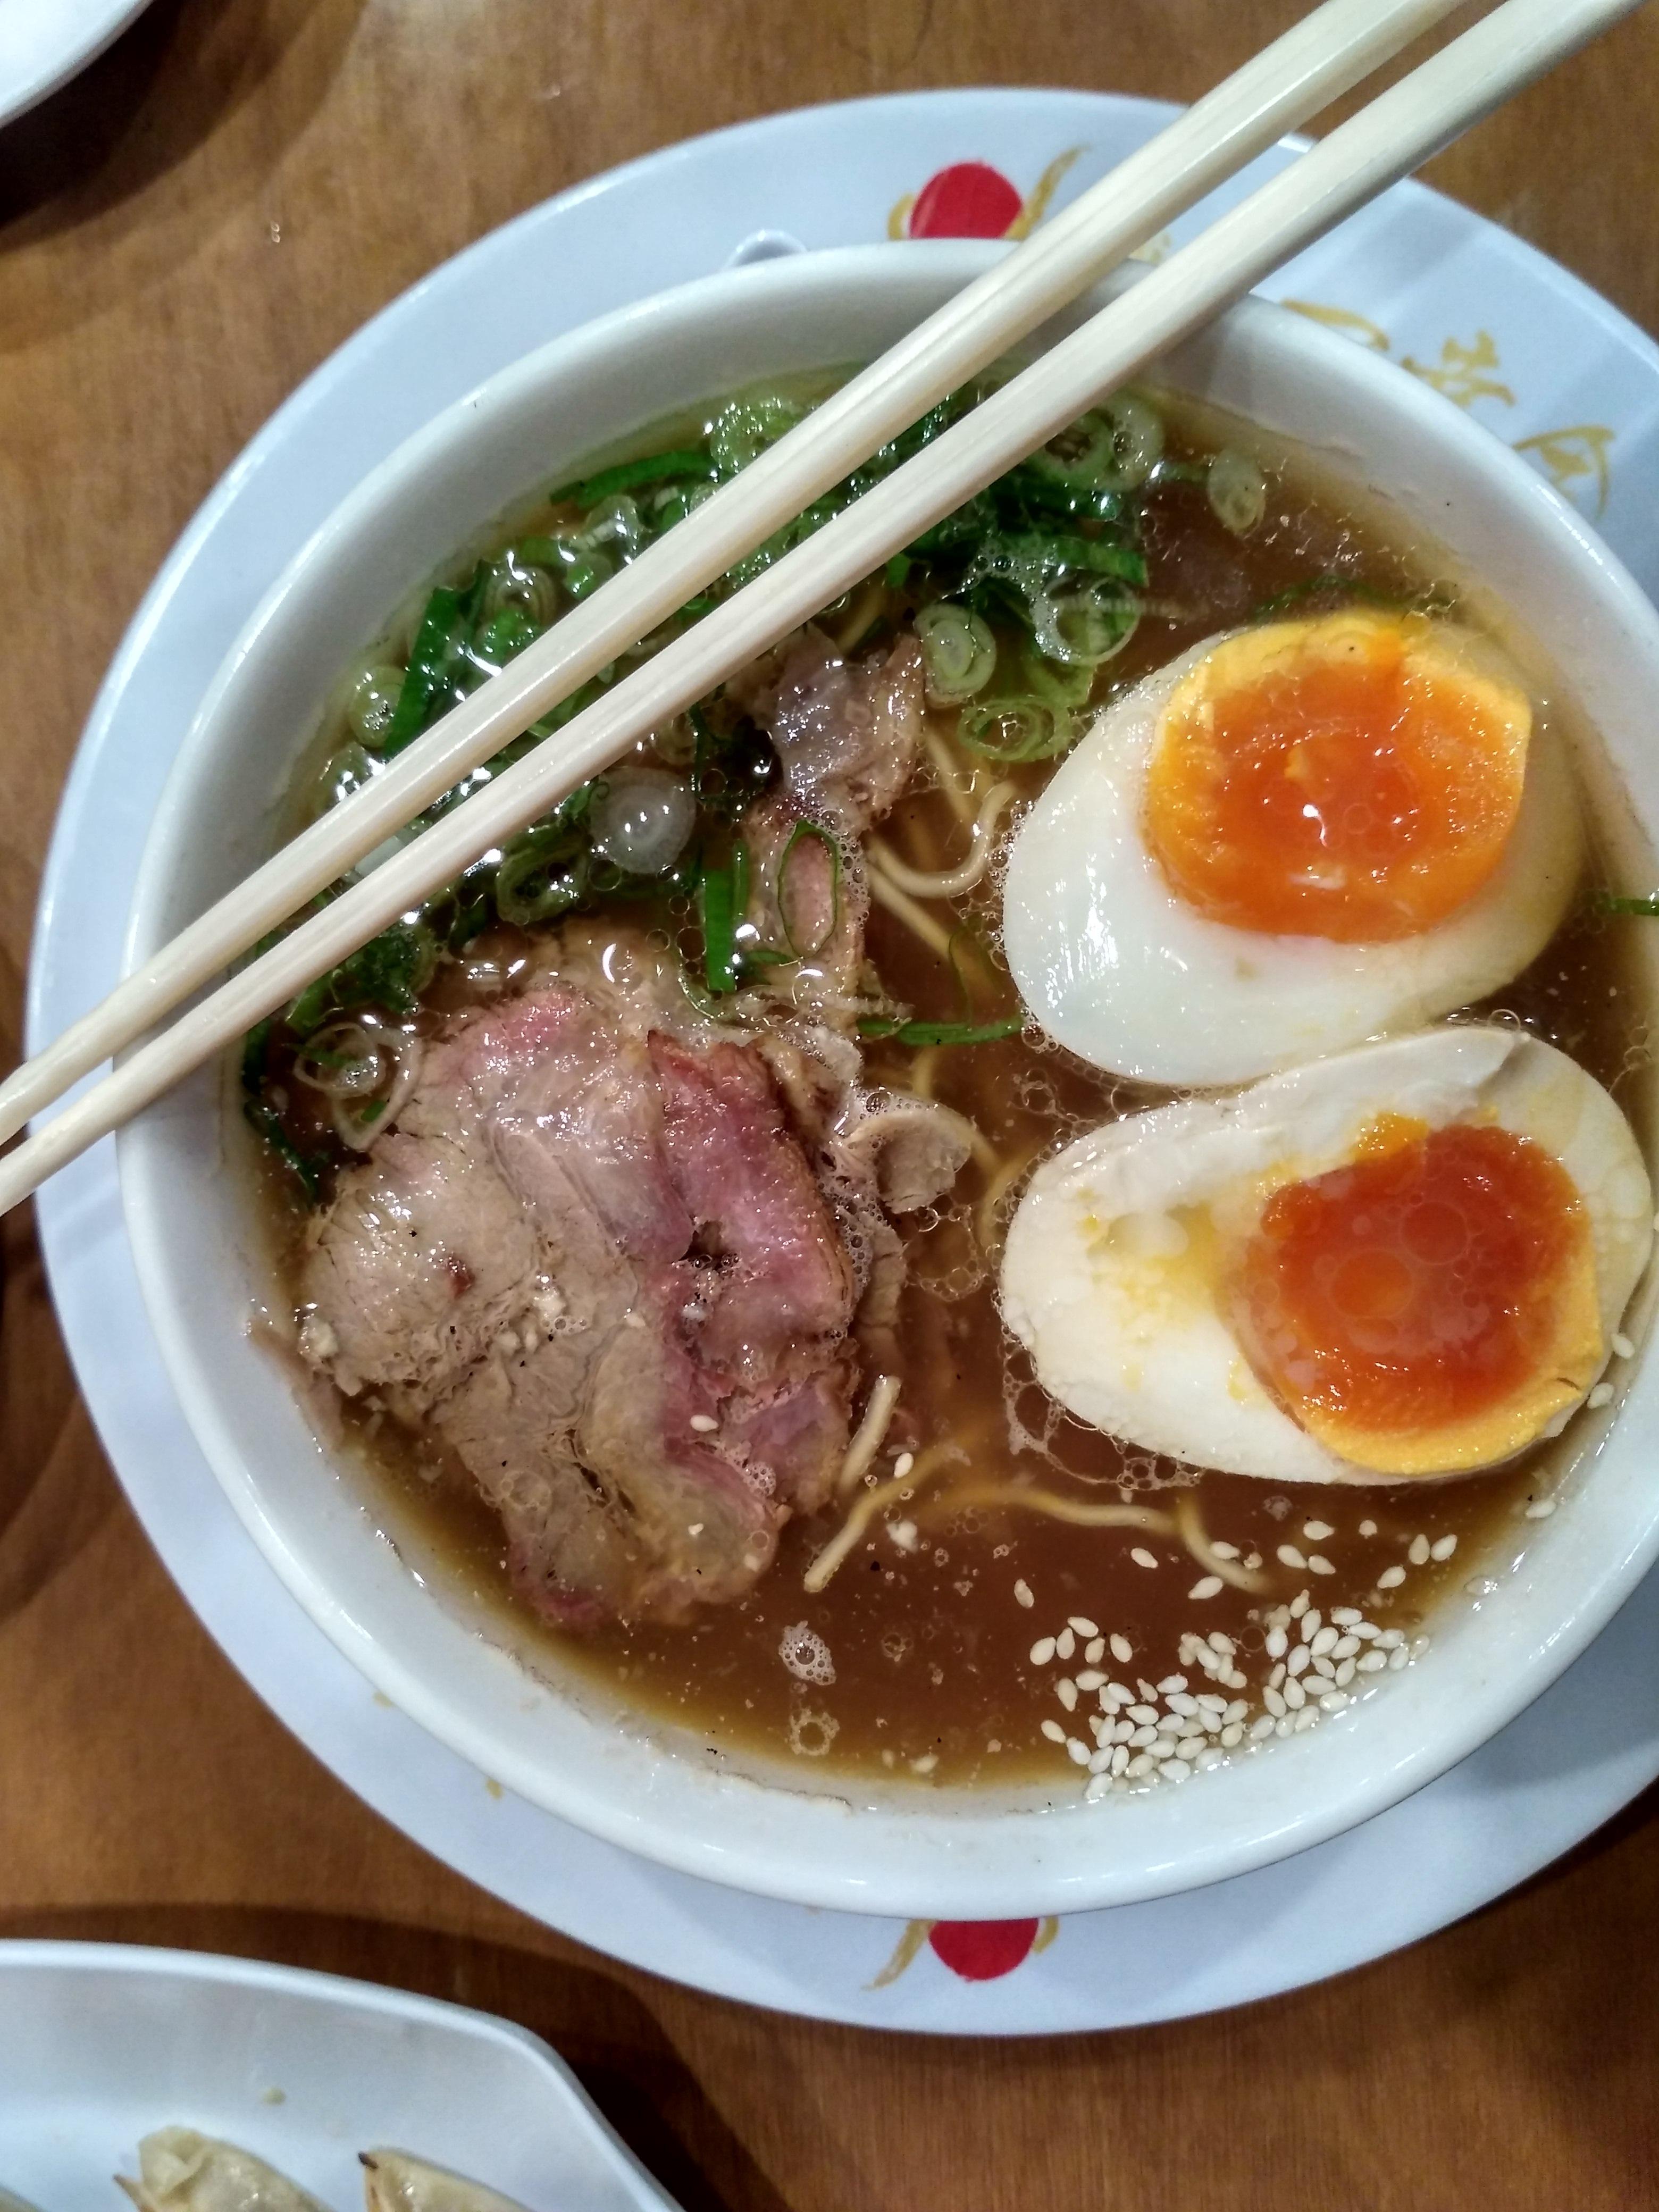 Gambar Daging Makan Siang Masakan Lezat Sup Mi Sumpit